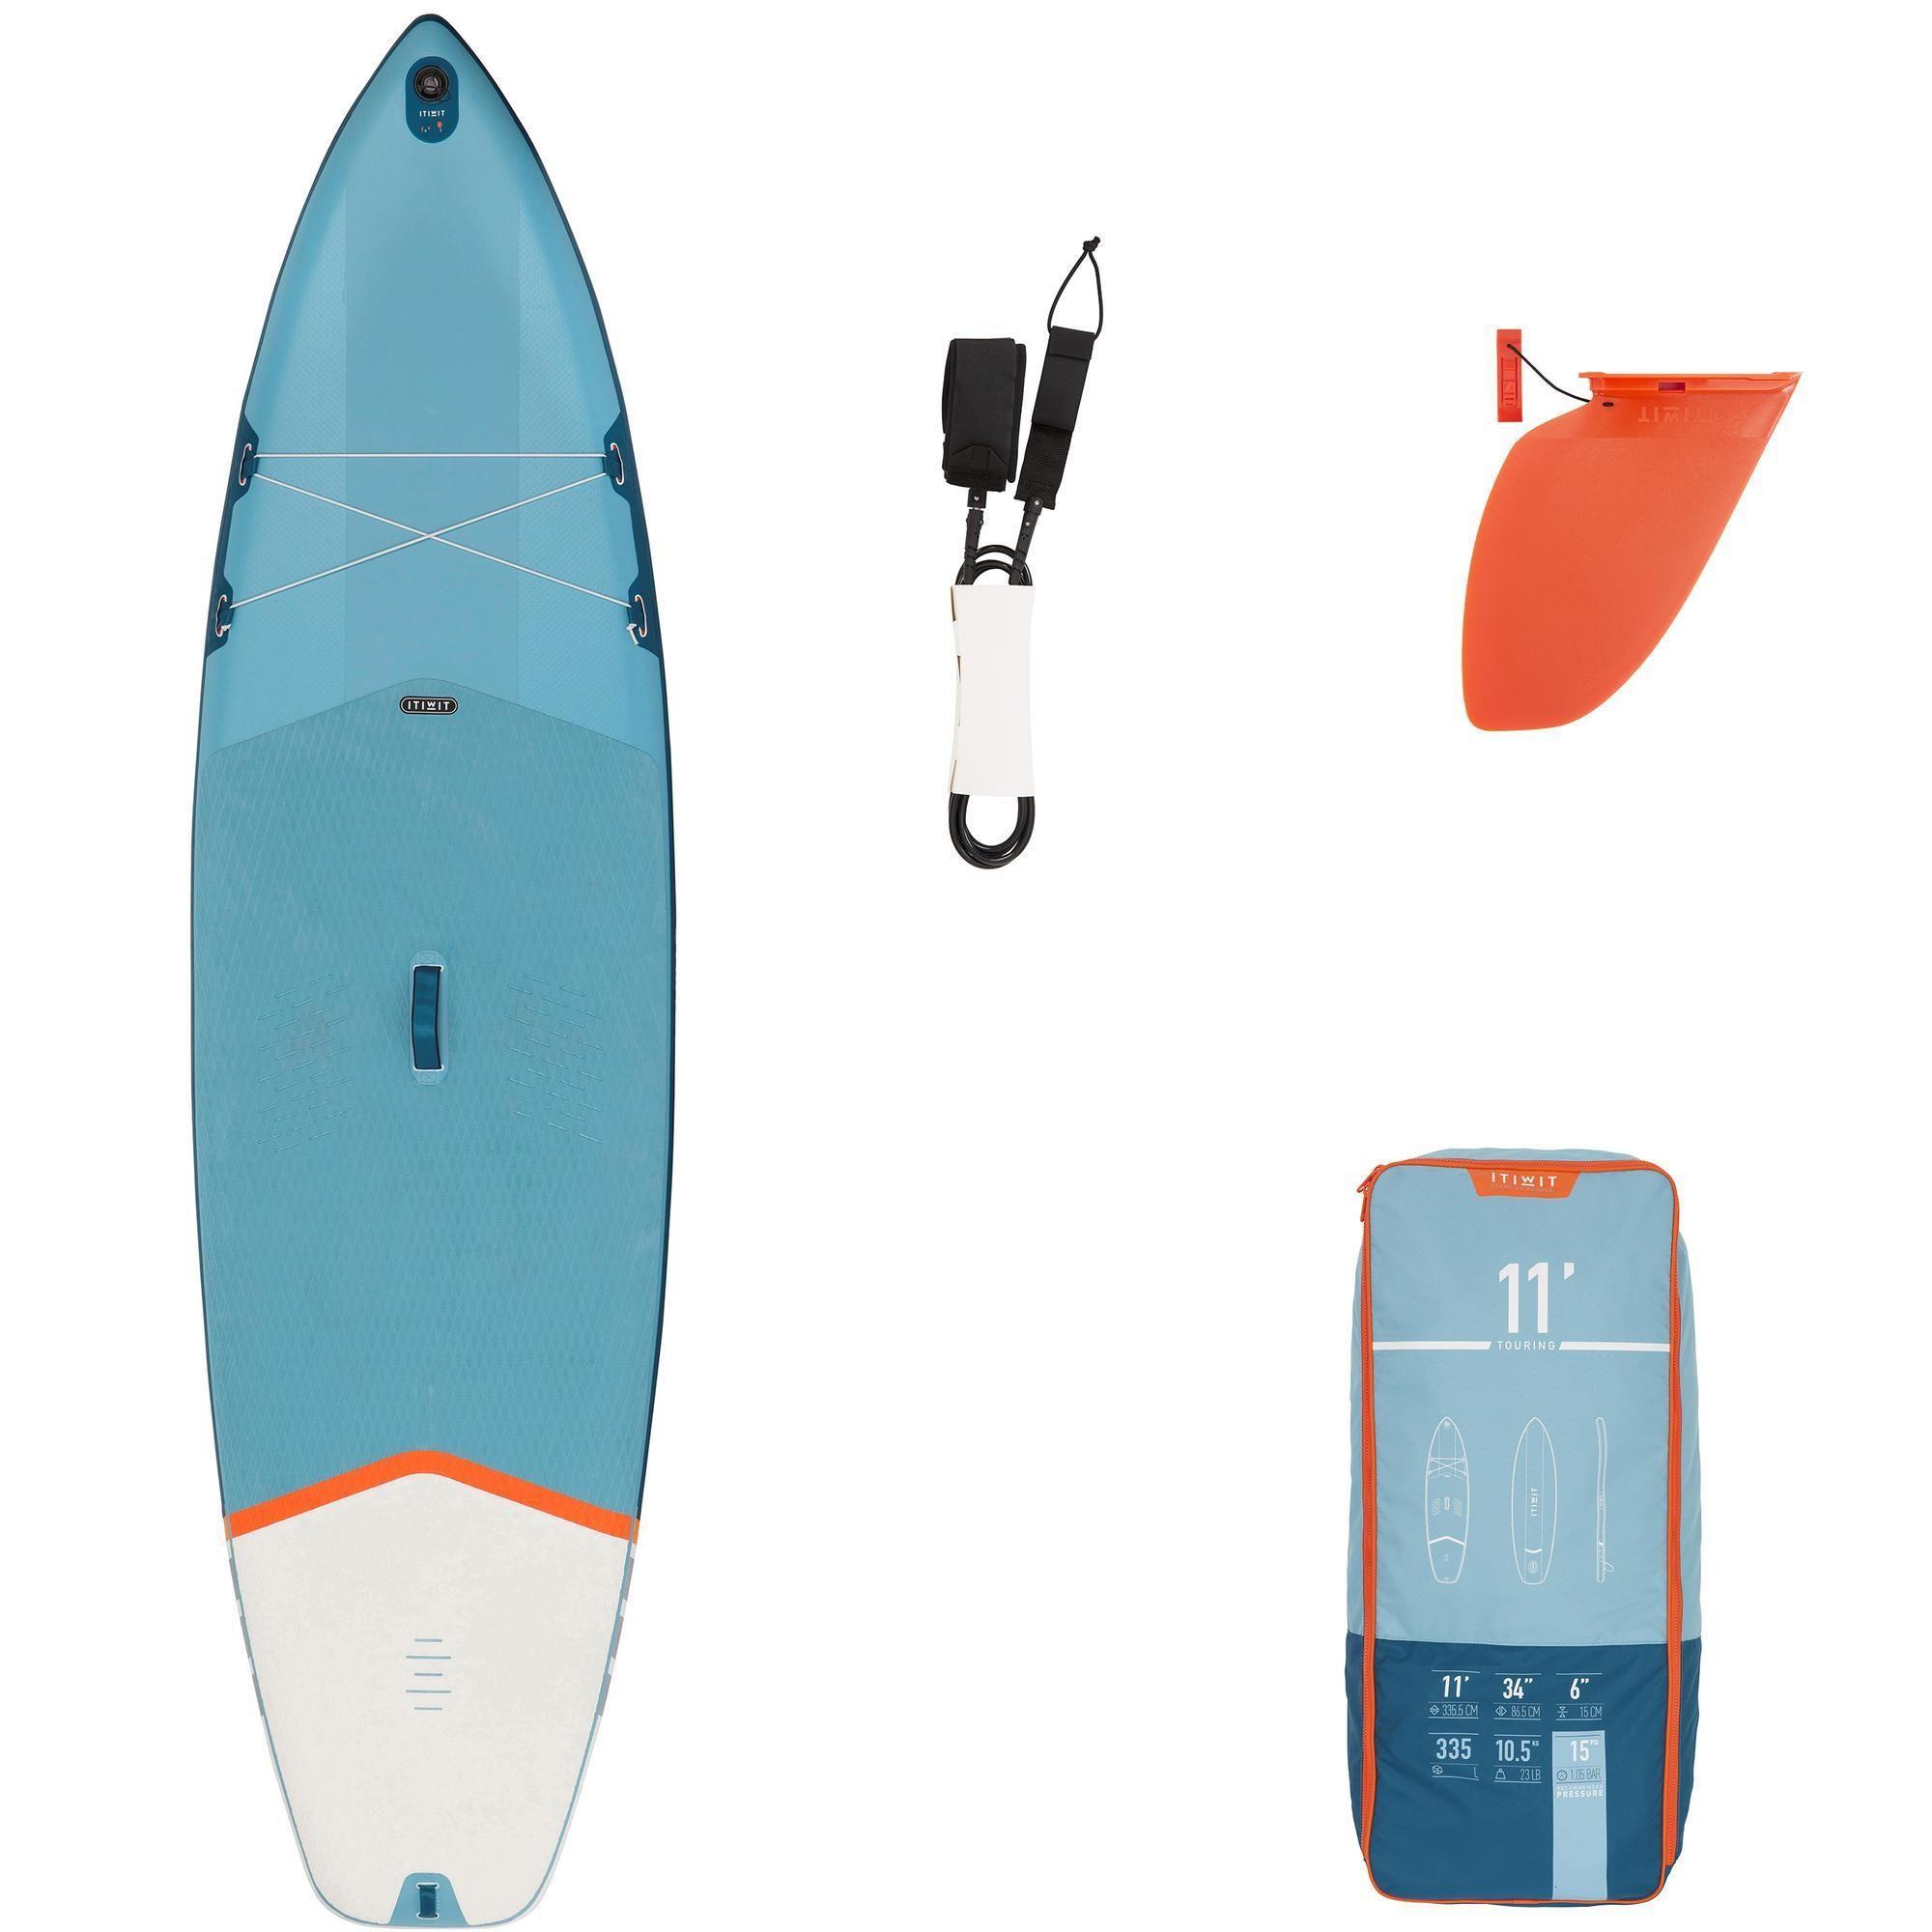 Stand Up Paddle Gonflable De Randonnee Debutant 11 Pieds Bleu En 2020 Stand Up Paddle Kayak Gonflable Sup Board